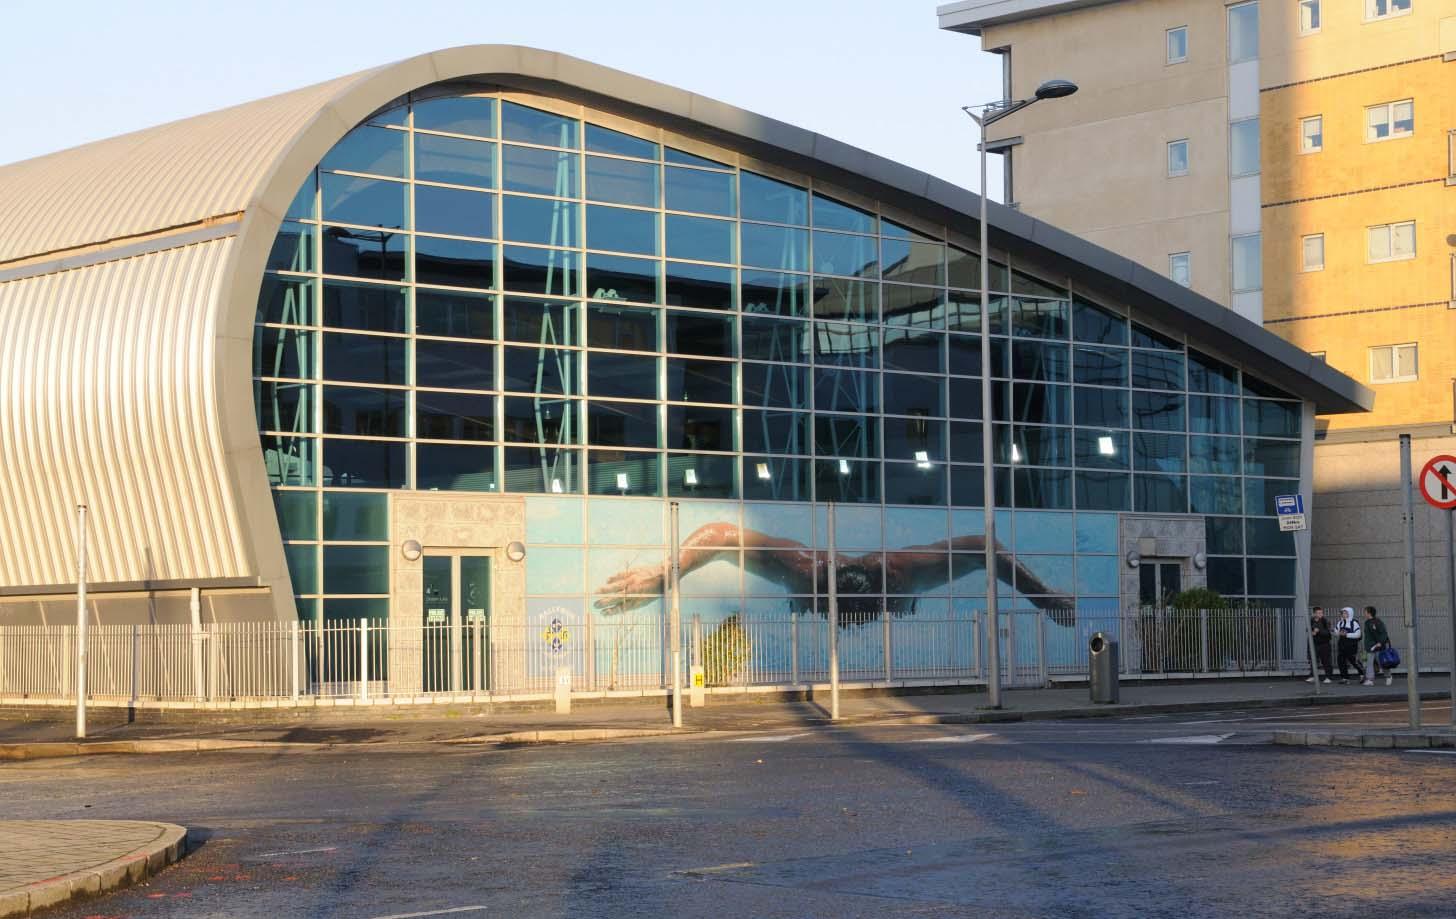 Ballymun Leisure Centre